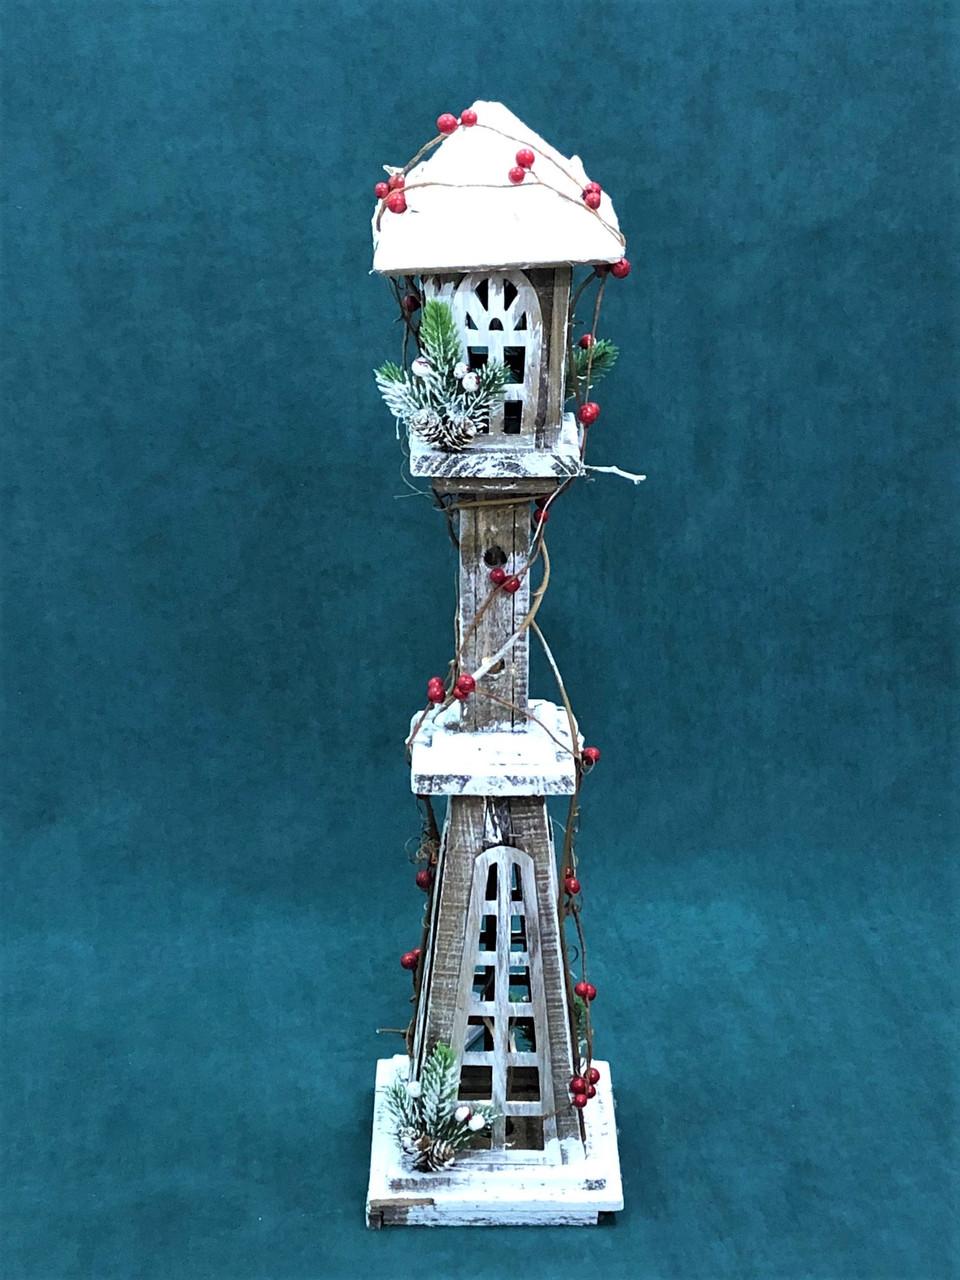 CHRISTMAS WOODEN LIGHT UP LANTERN - Small 78CM Christmas Decoration